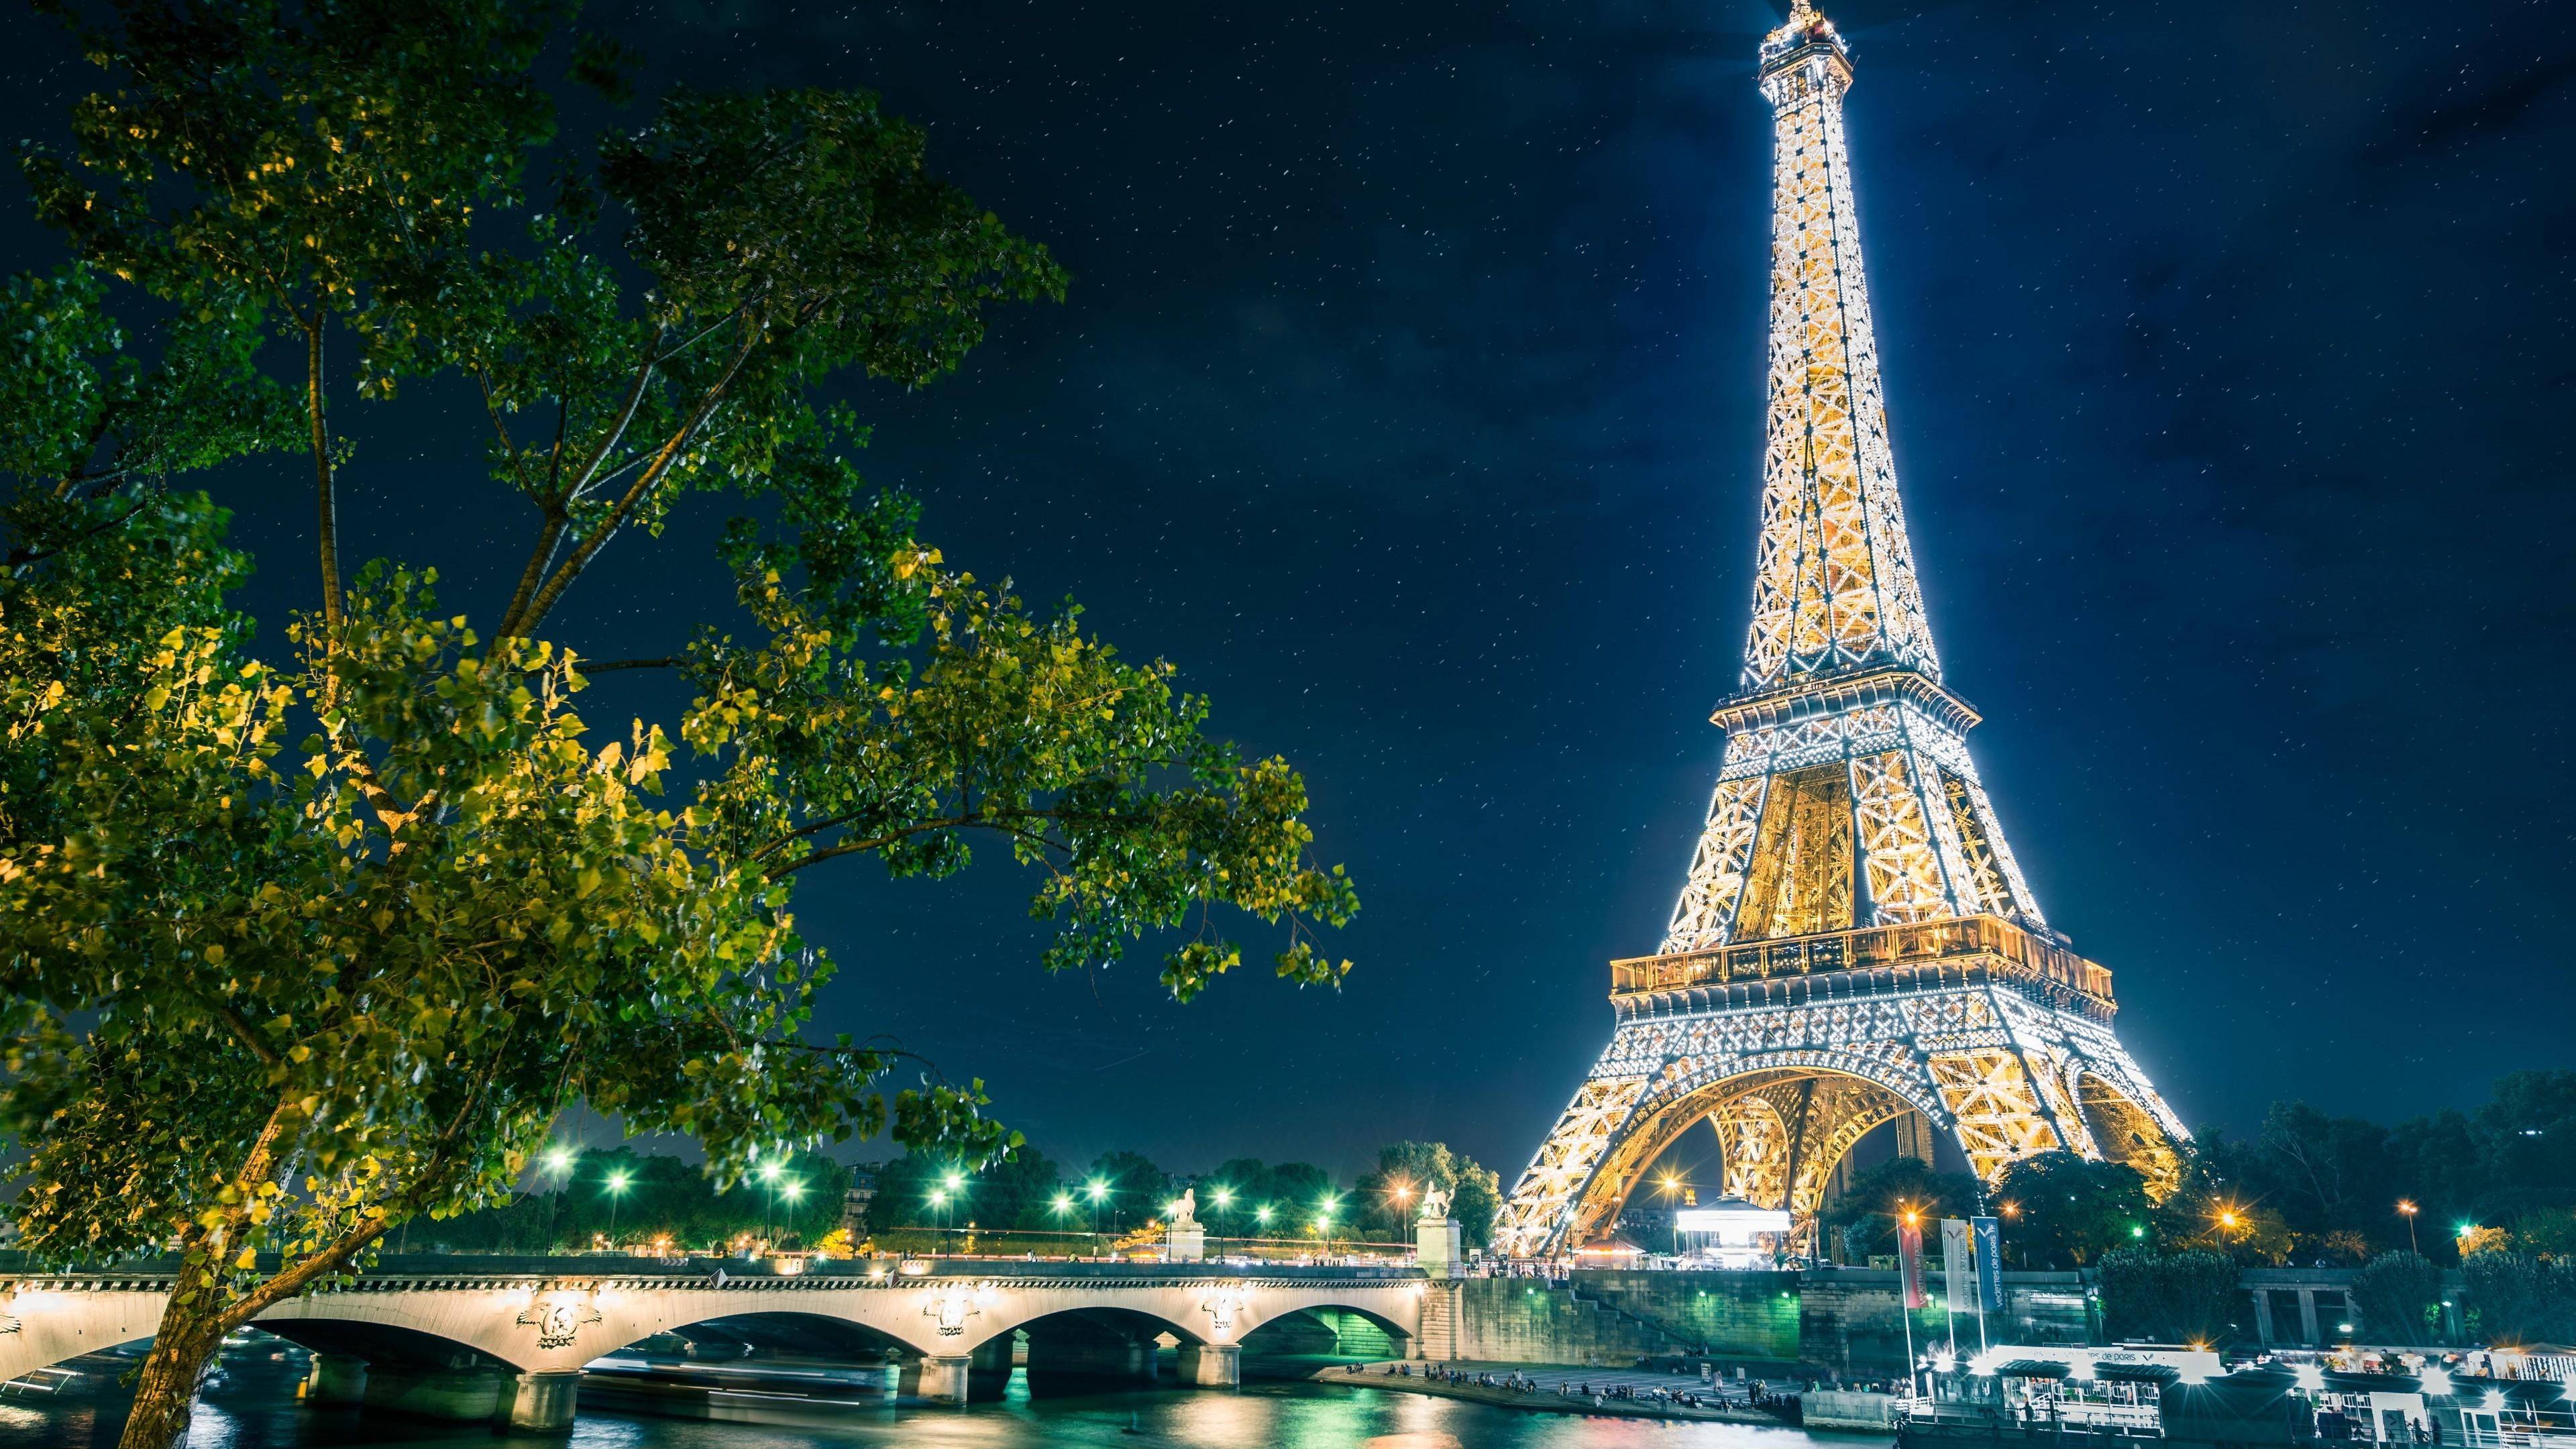 Paris At Night Wallpapers Top Free Paris At Night Backgrounds Wallpaperaccess